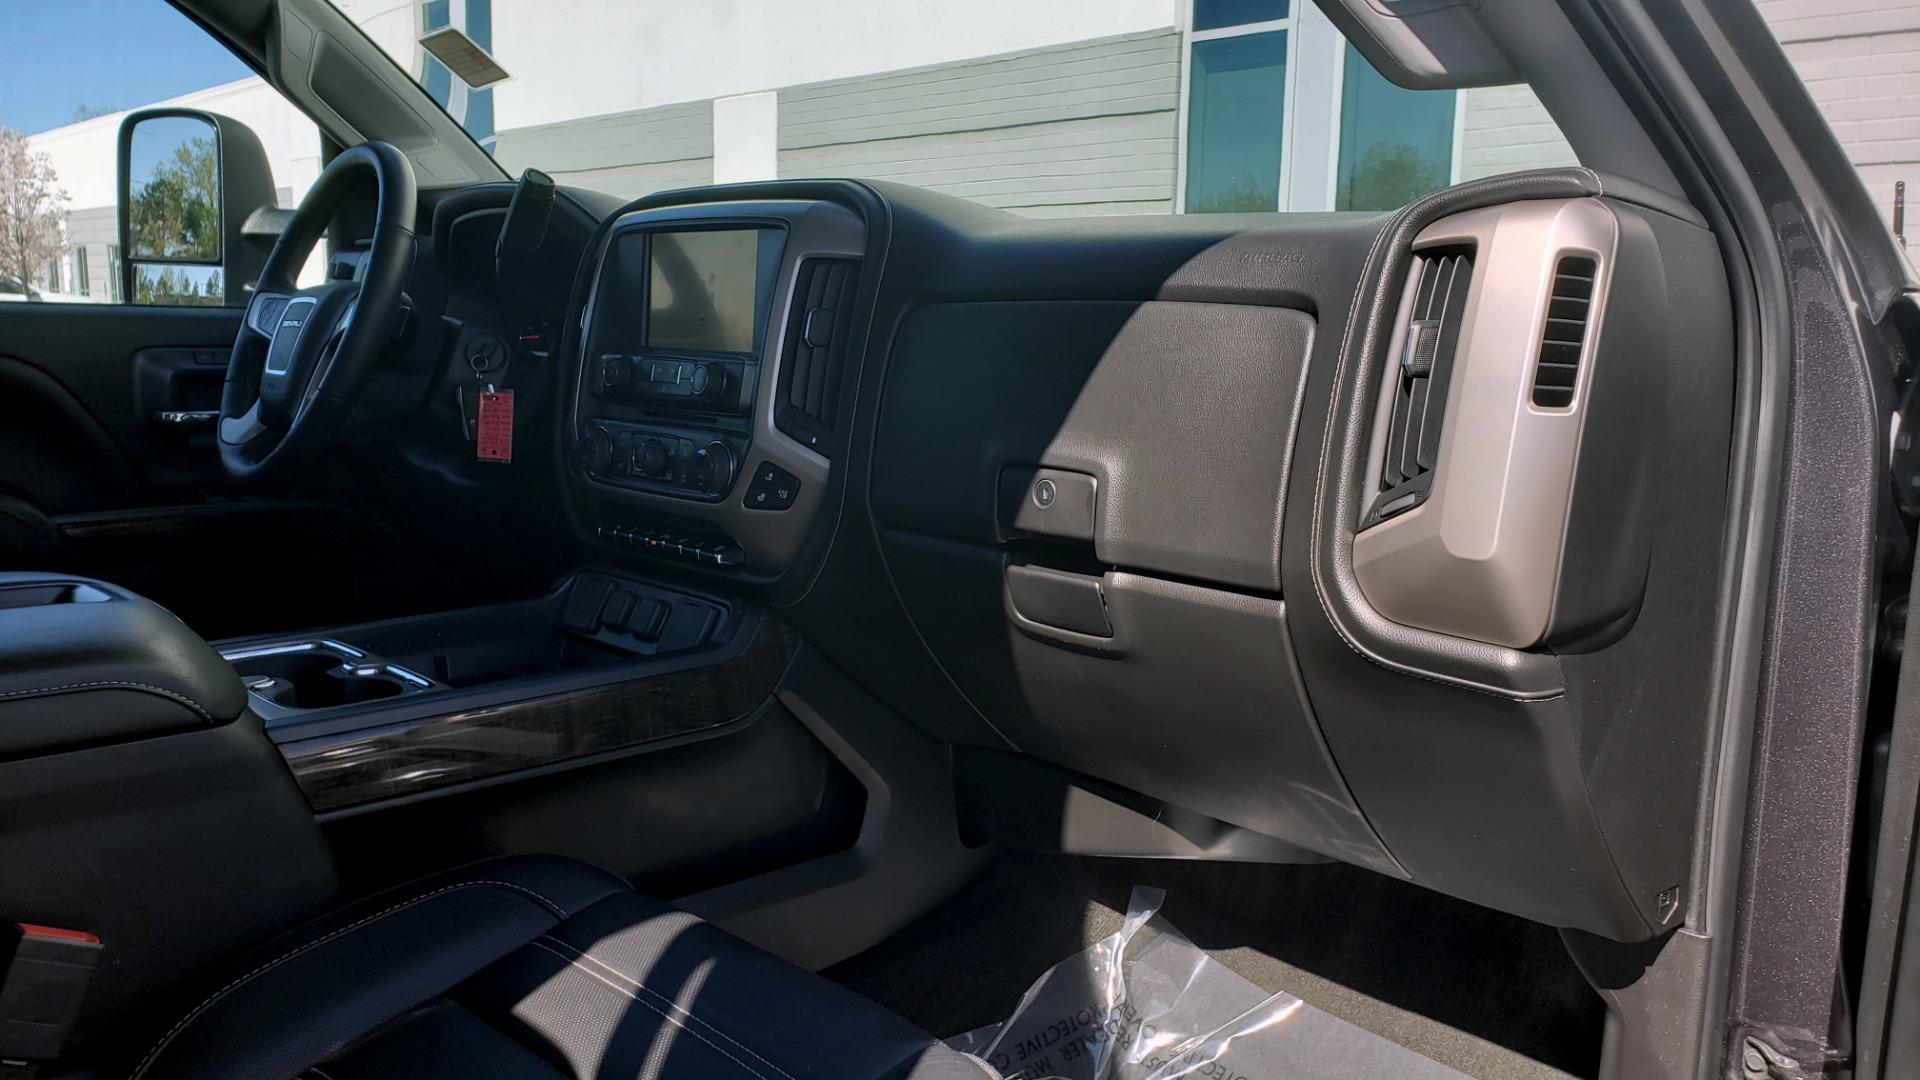 Used 2015 GMC SIERRA 2500HD DENALI 4WD CREWCAB / 6.6L DURAMAX / 6-SPD AUTO / NAV / BOSE for sale $50,995 at Formula Imports in Charlotte NC 28227 78